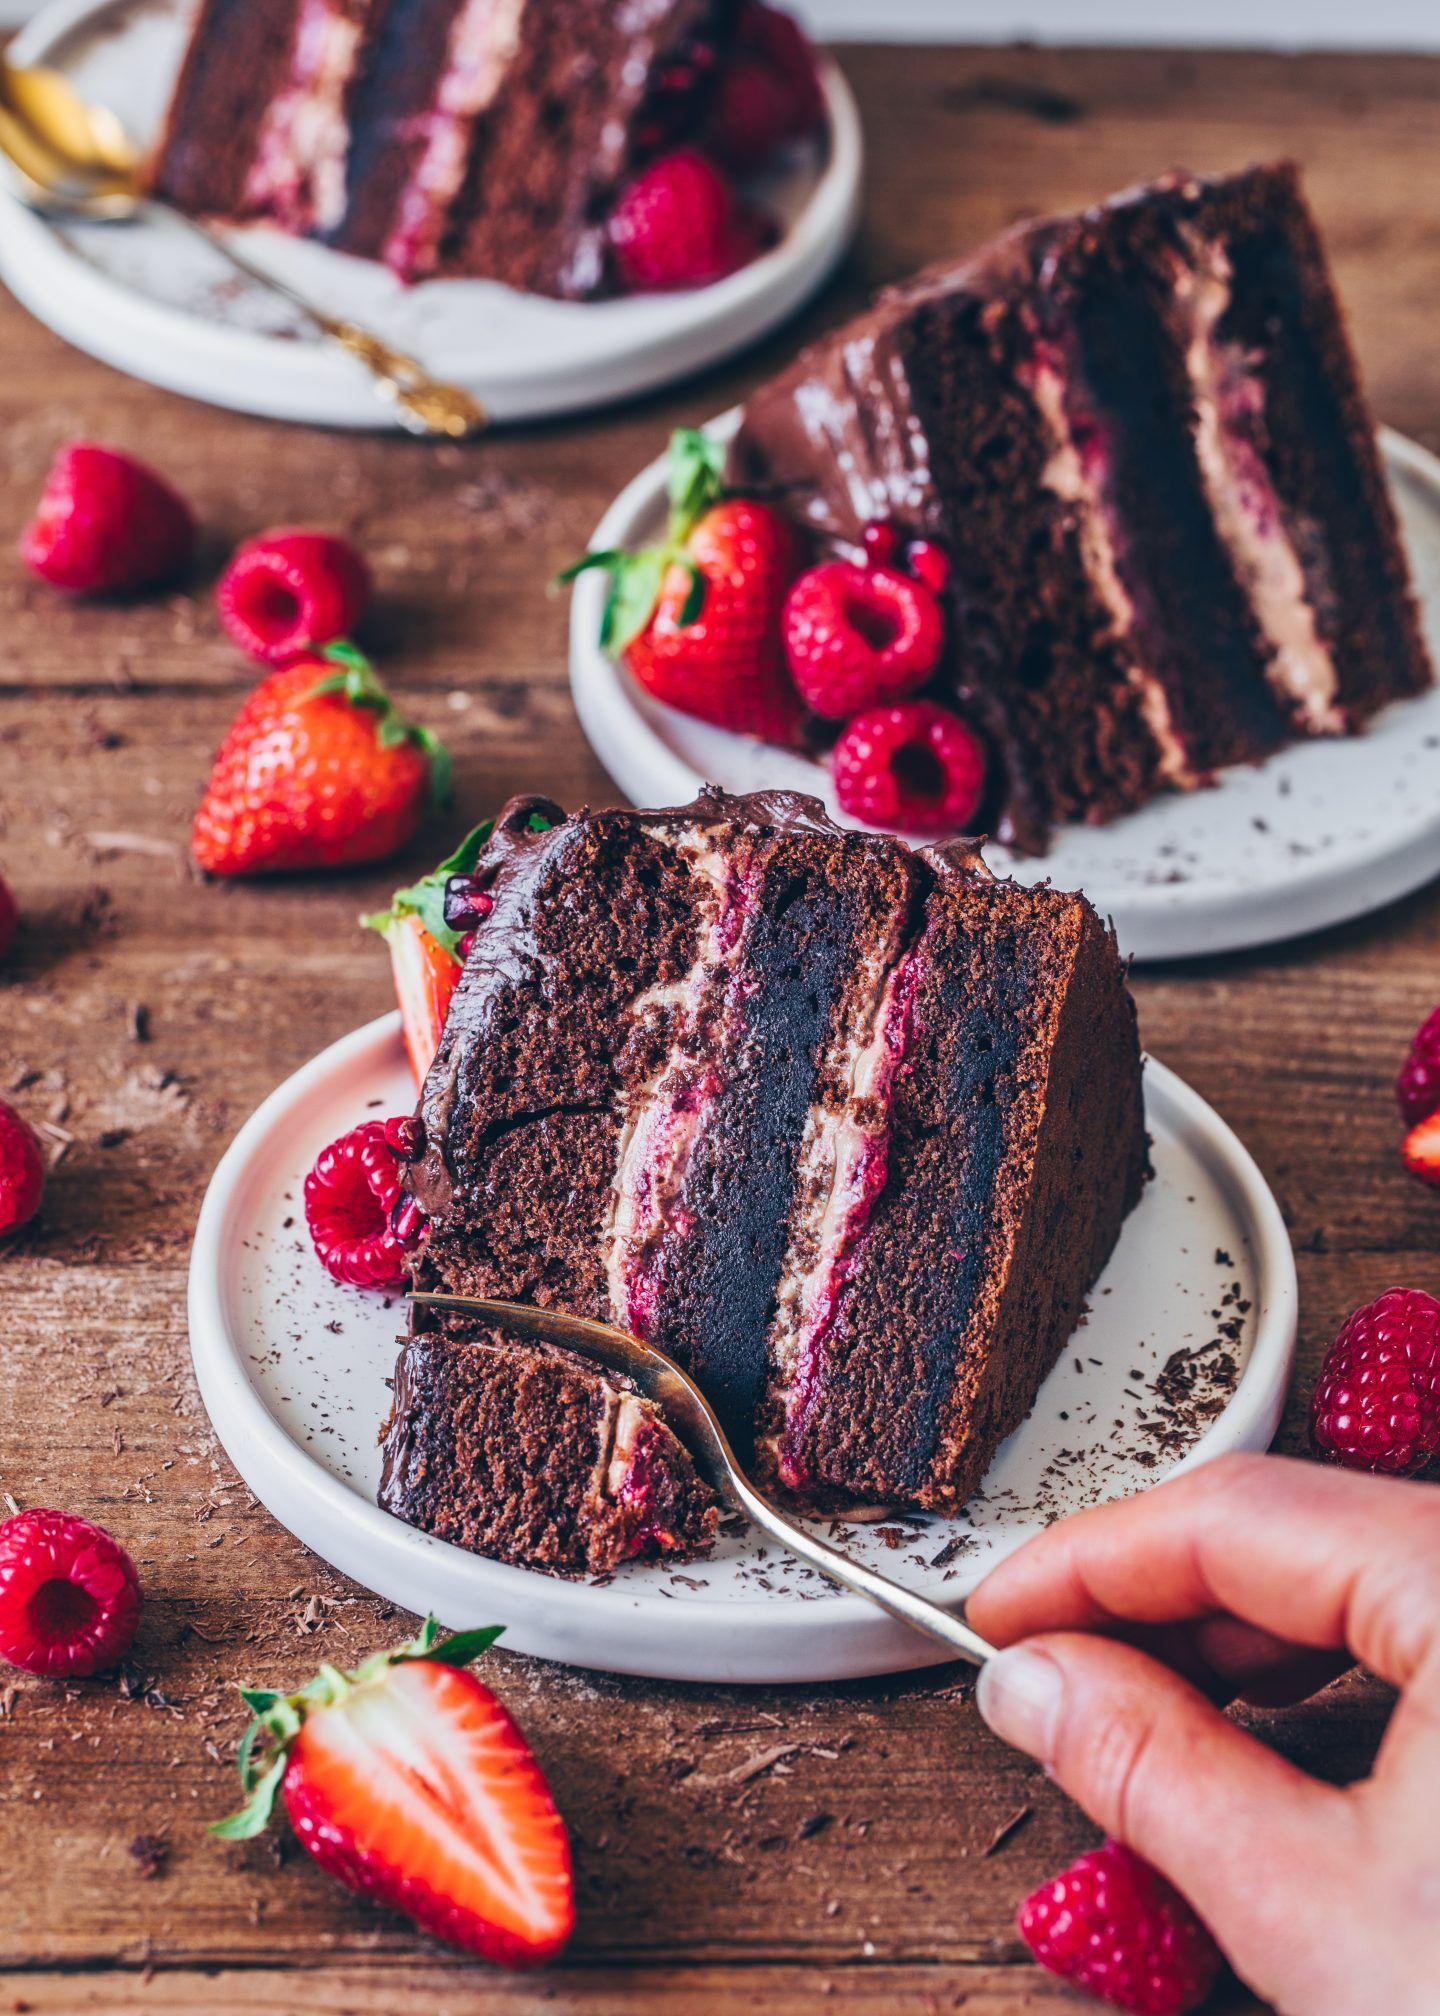 Chocolate Raspberry Cake Vegan Bianca Zapatka Recipes Recipe Raspberry Cake Recipes Chocolate Raspberry Cake Recipe Raspberry Cake